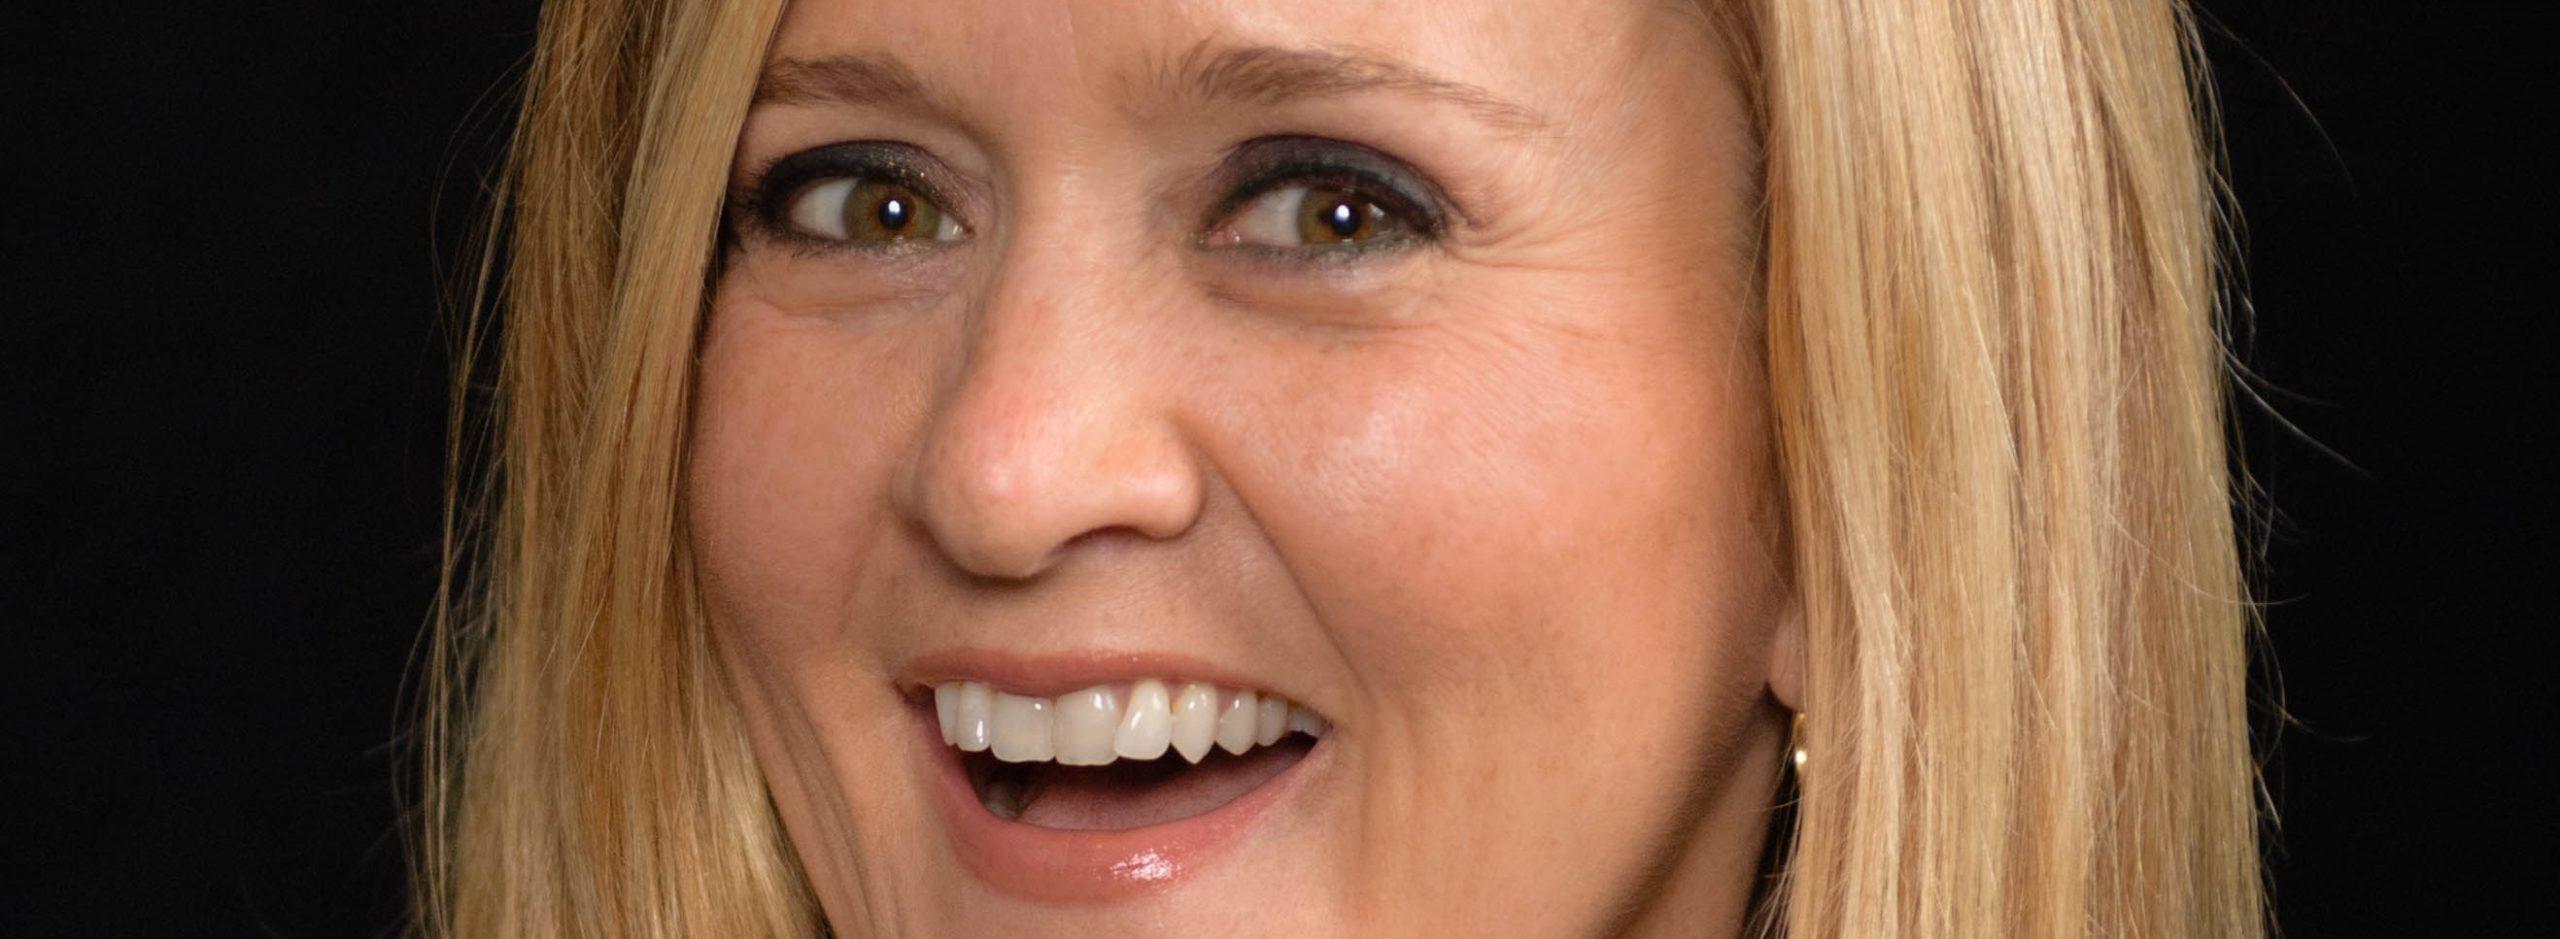 Biografía de Samantha Bee